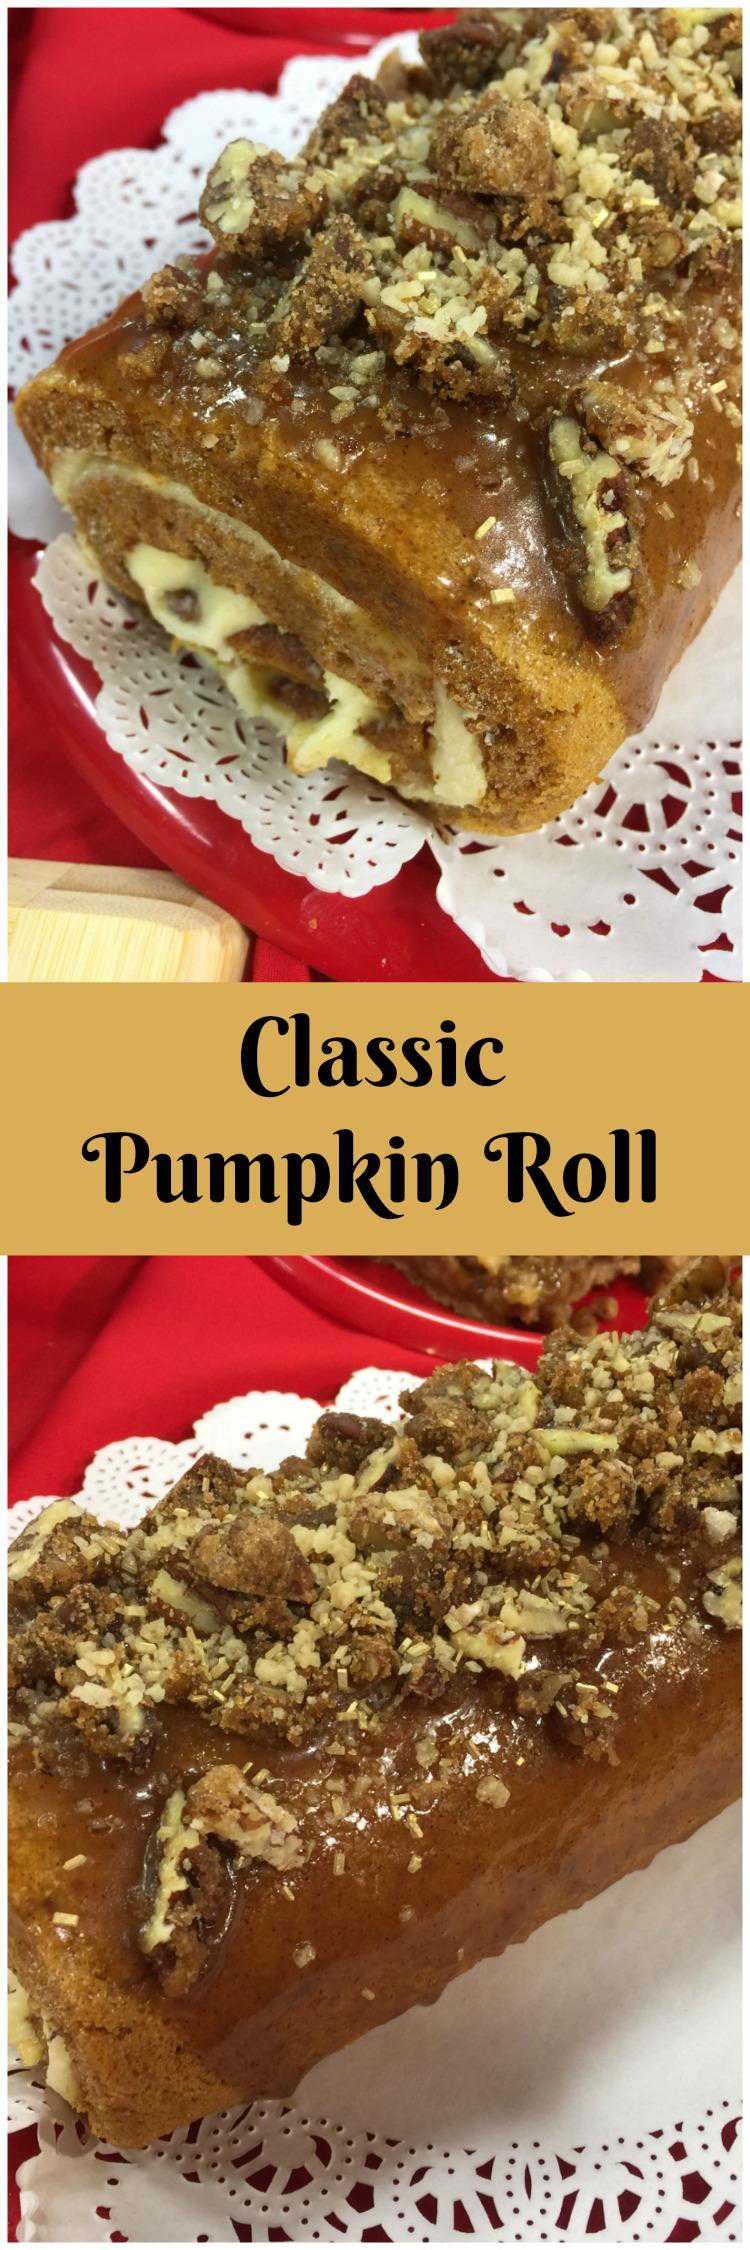 Classic Pumpkin Roll collage via diningwithdebbie.net